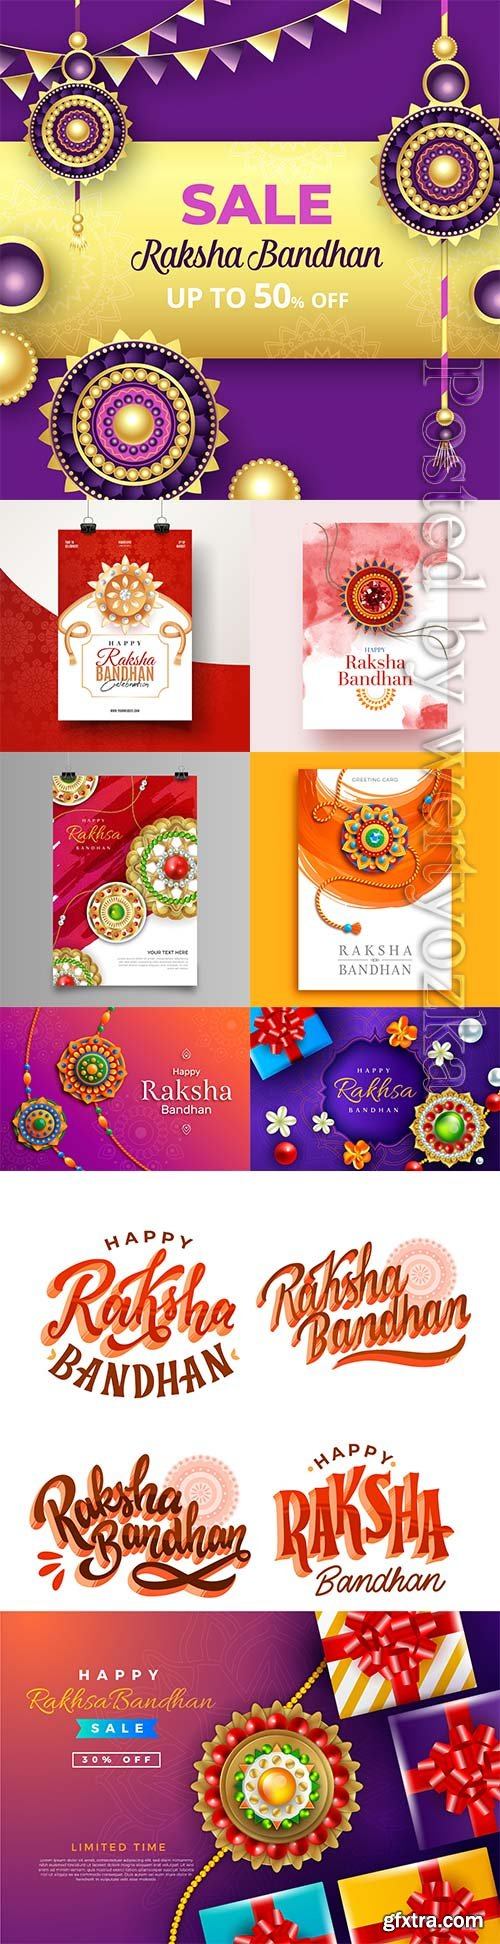 Flat raksha bandhan greeting vector card